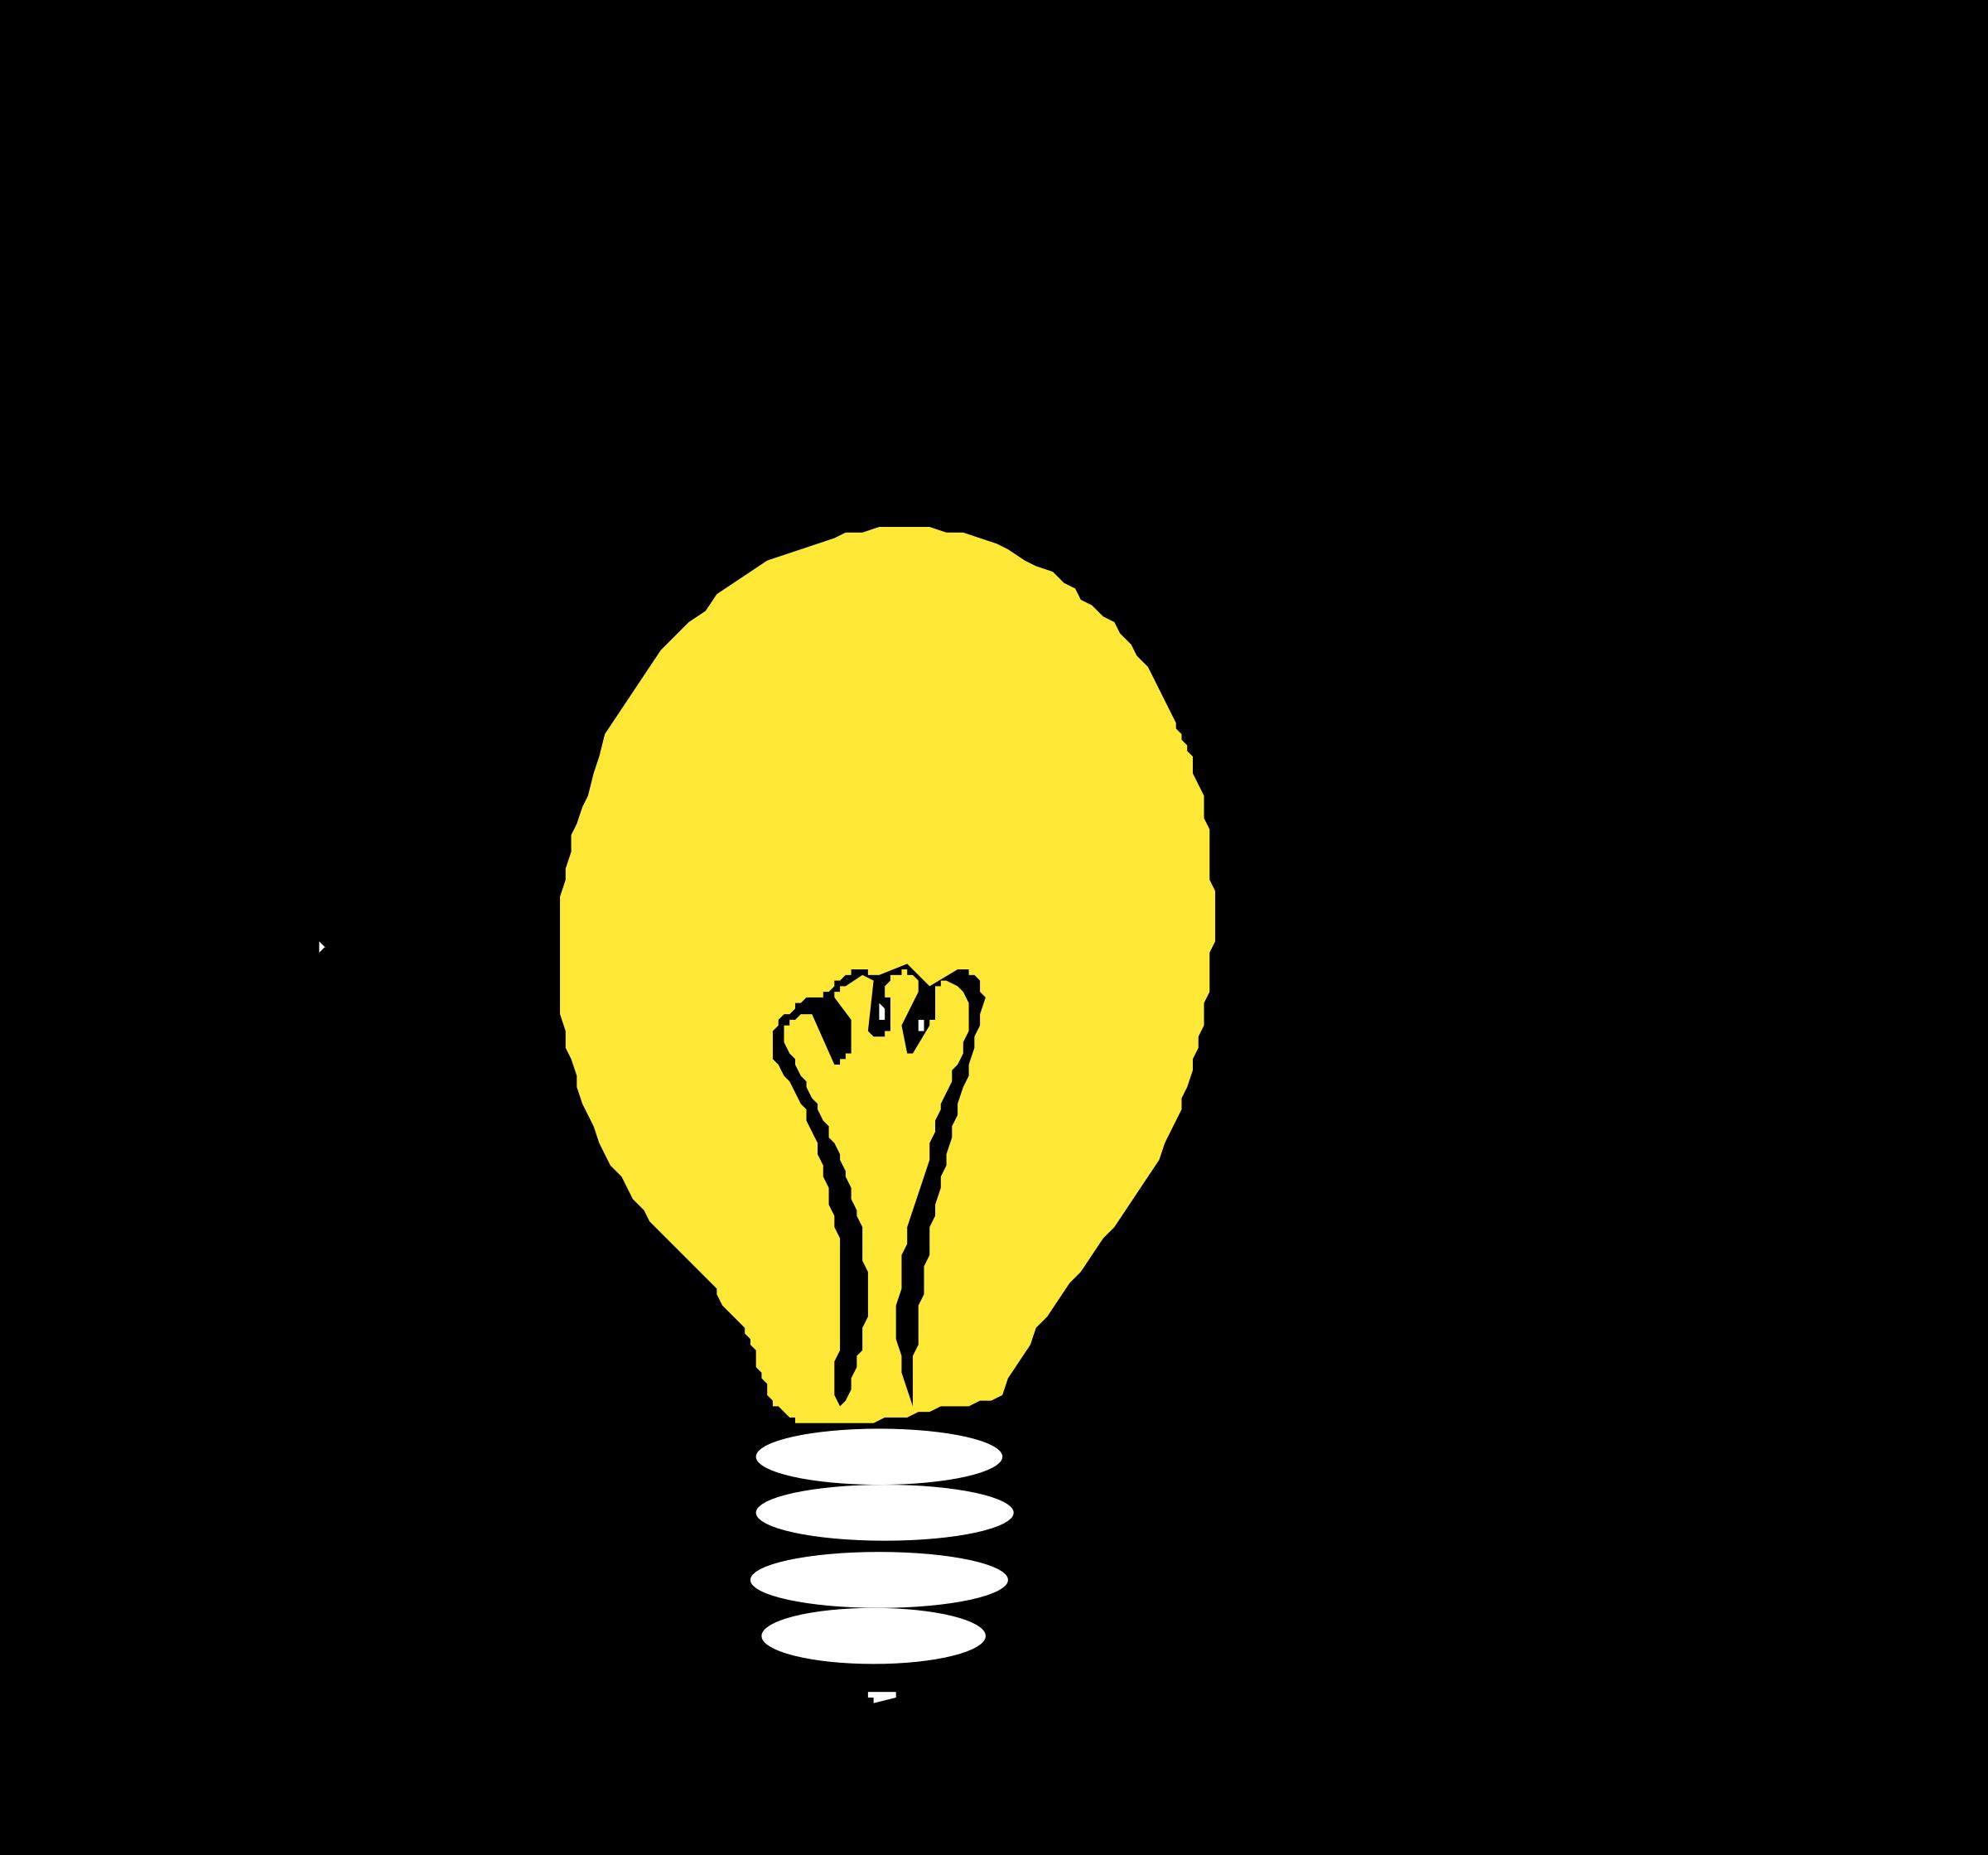 2400x2239 Lightbulb Light Bulb Clip Art Image Free Clipart Images